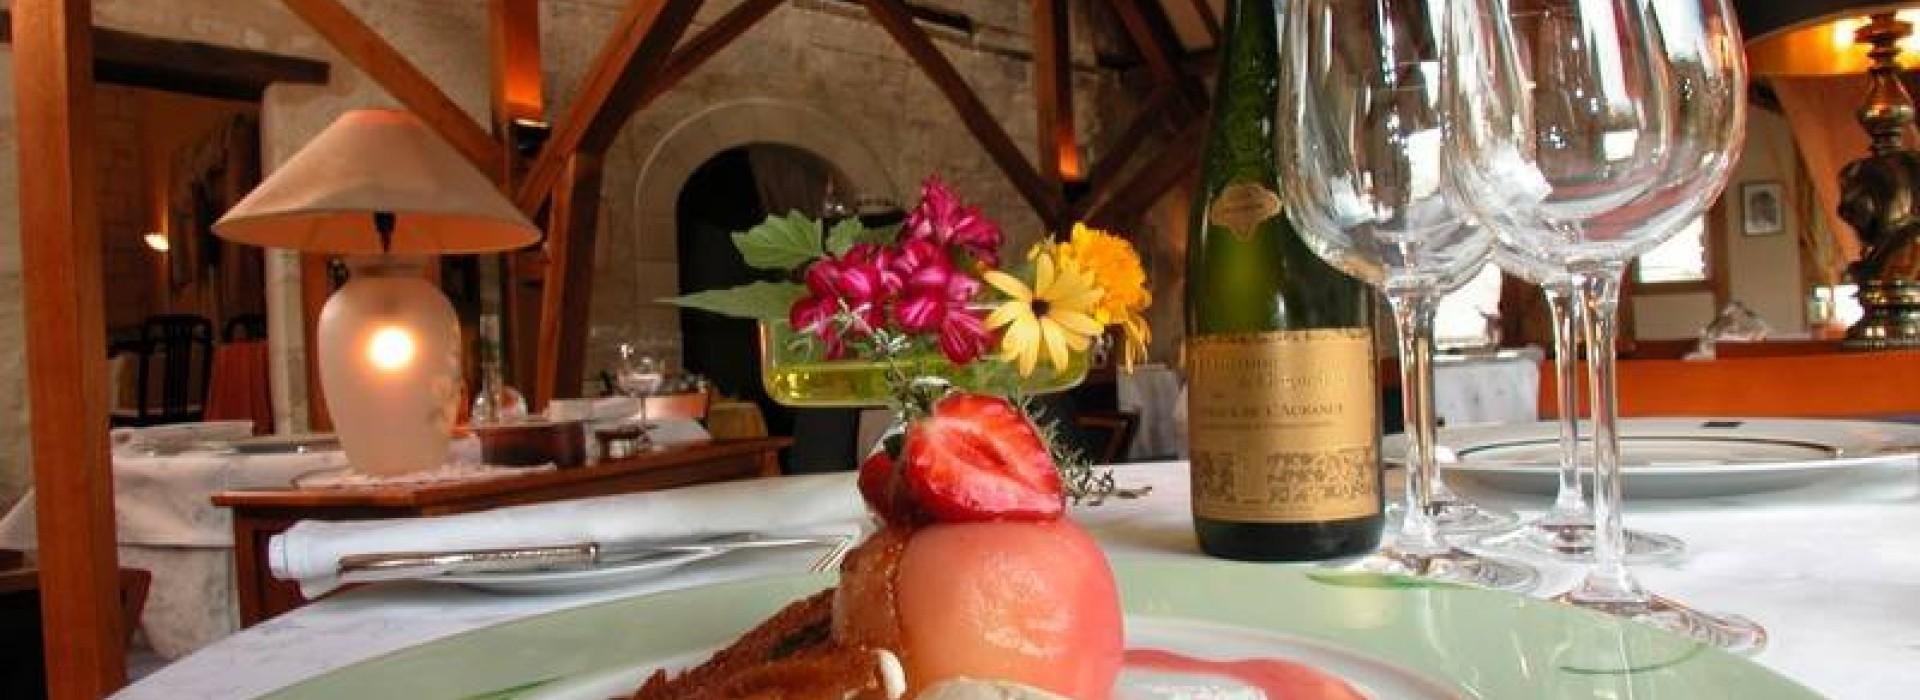 LES MENESTRELS: Restaurants en Pays de la Loire